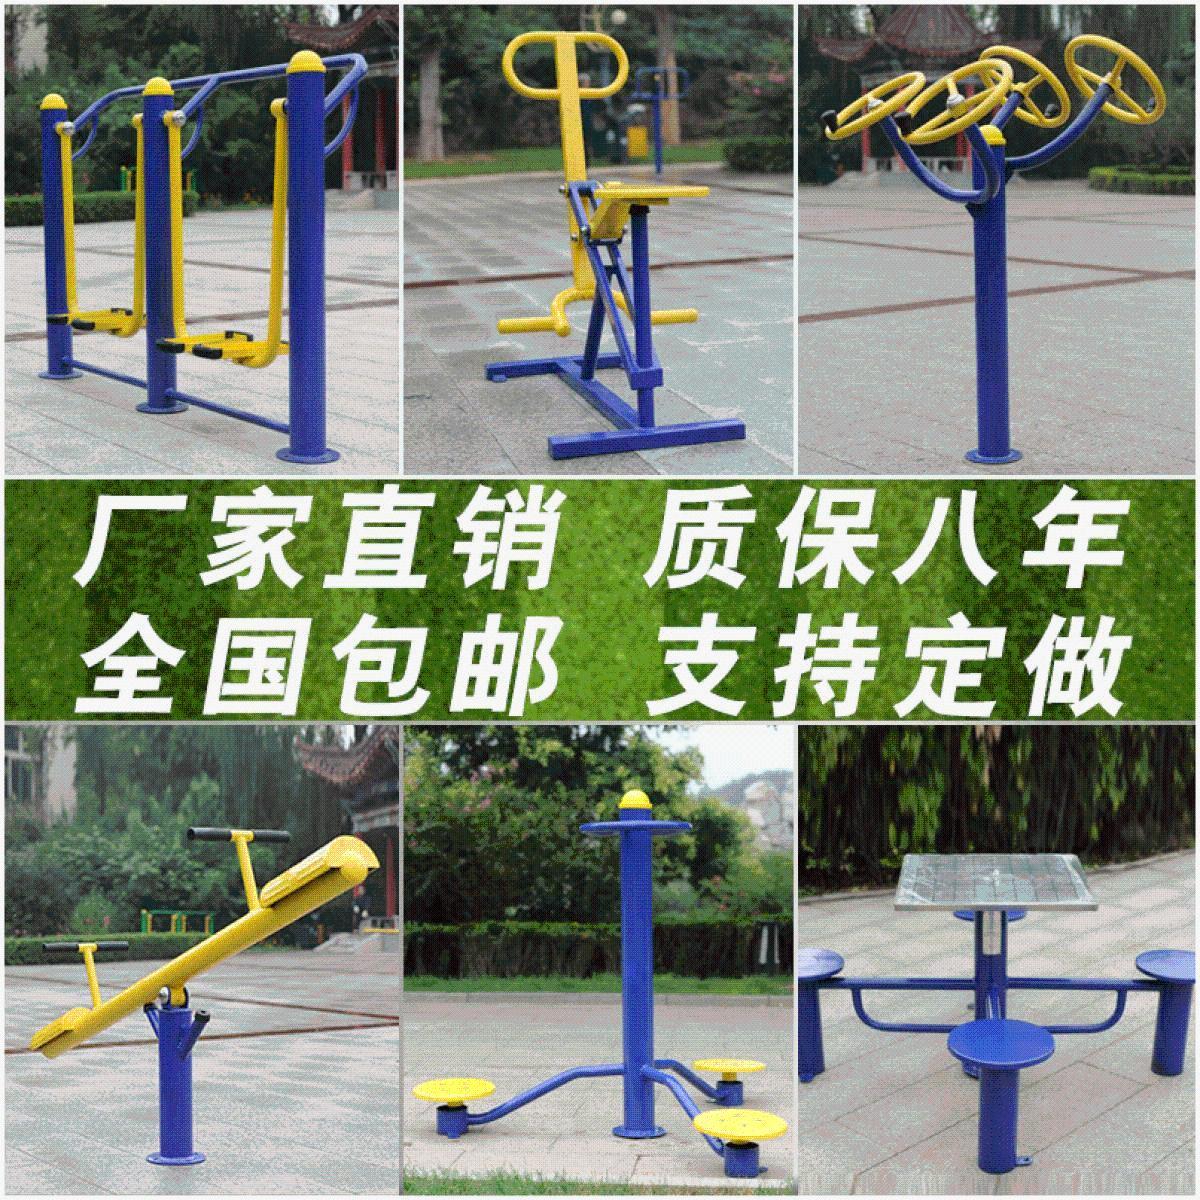 Игрушки для активного отдыха Артикул 602272206756